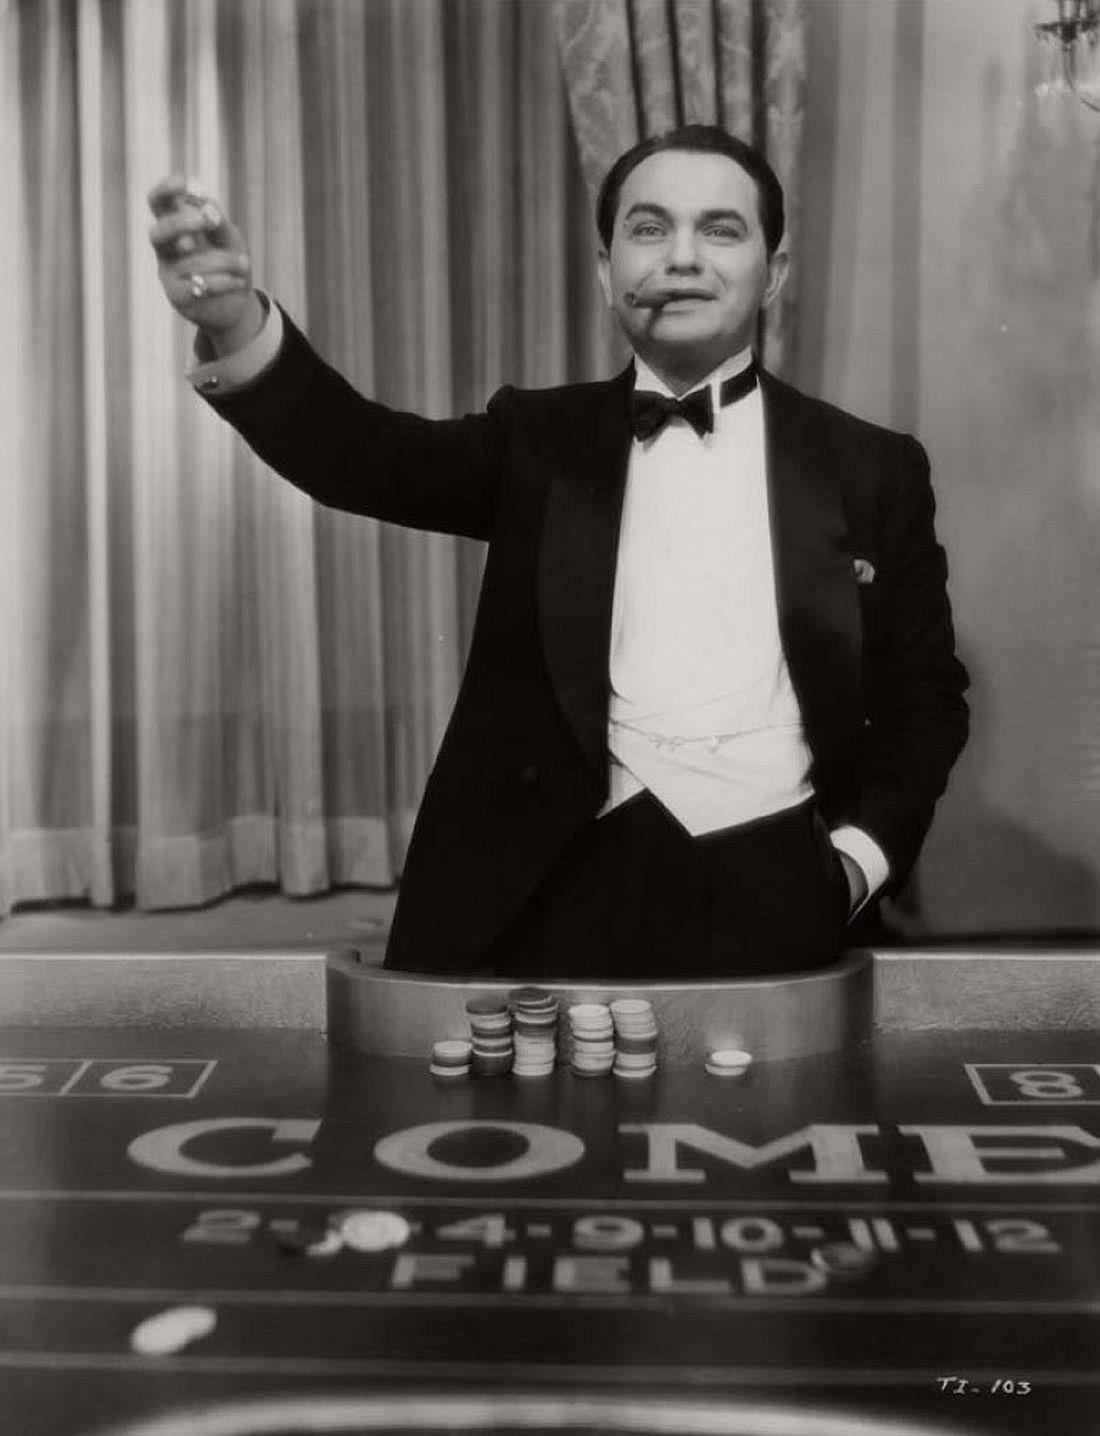 ttle-caesar-1931-behind-the-scenes-making-film-17